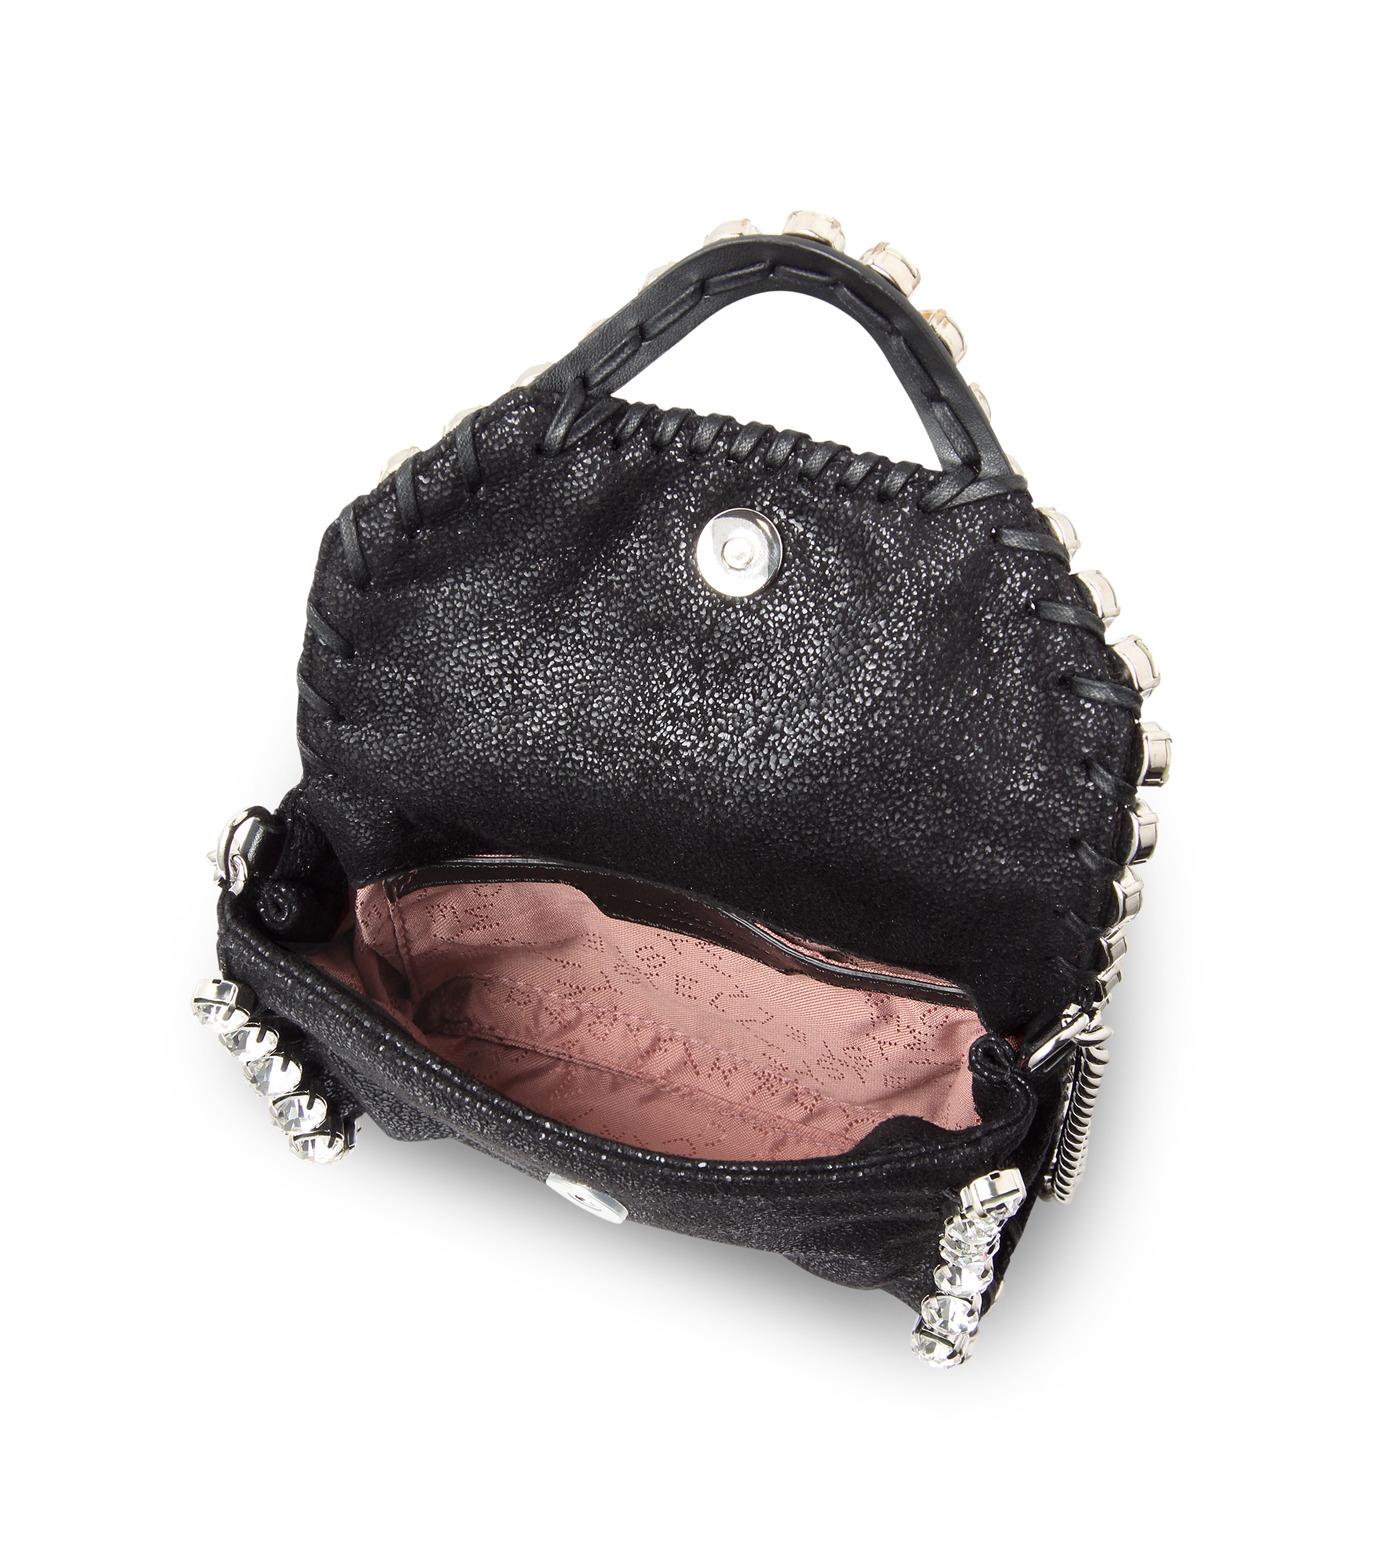 Stella McCartney(ステラマッカートニー)のTiny Fold Over Cross-Body-BLACK(バッグ/ショルダーバッグ/bag/shoulder bag)-391697-W9746-13 拡大詳細画像4